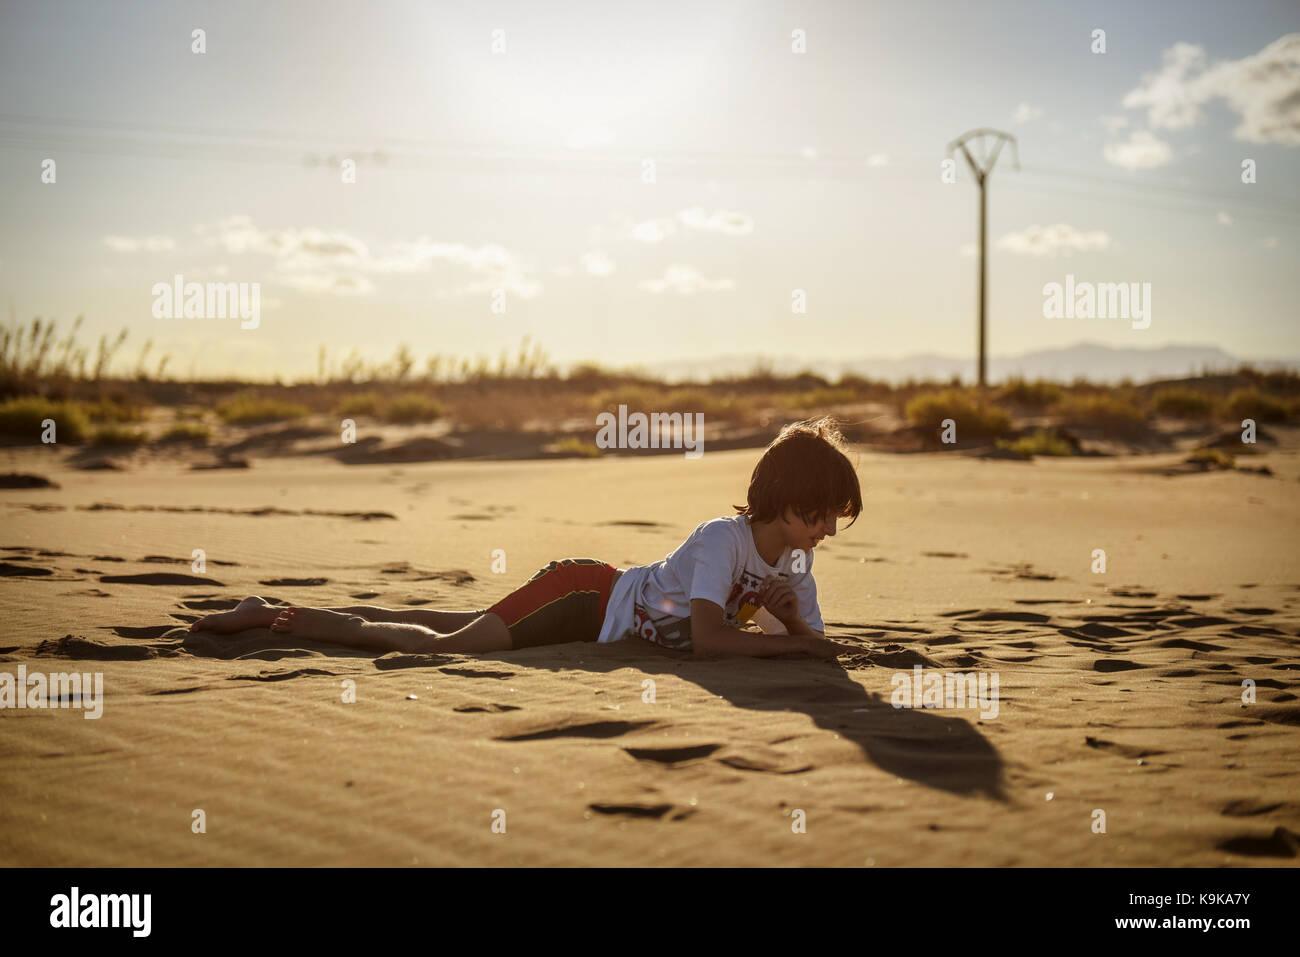 Entspannt Junge in den Sand bei Sonnenuntergang Stockbild